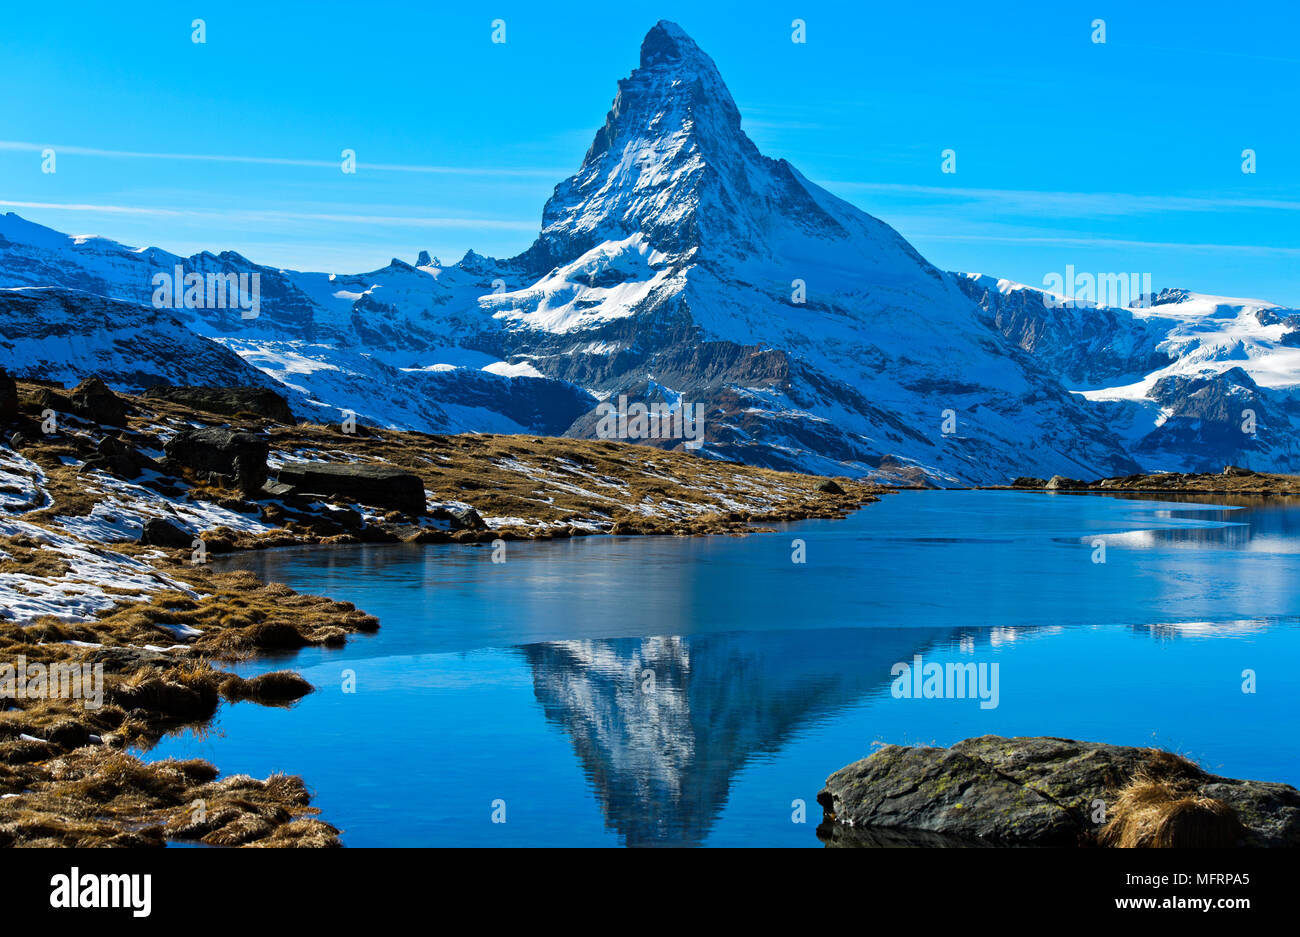 Snowy Matterhorn riflessa nella parzialmente congelato Stellisee, Zermatt, Vallese, Svizzera Immagini Stock